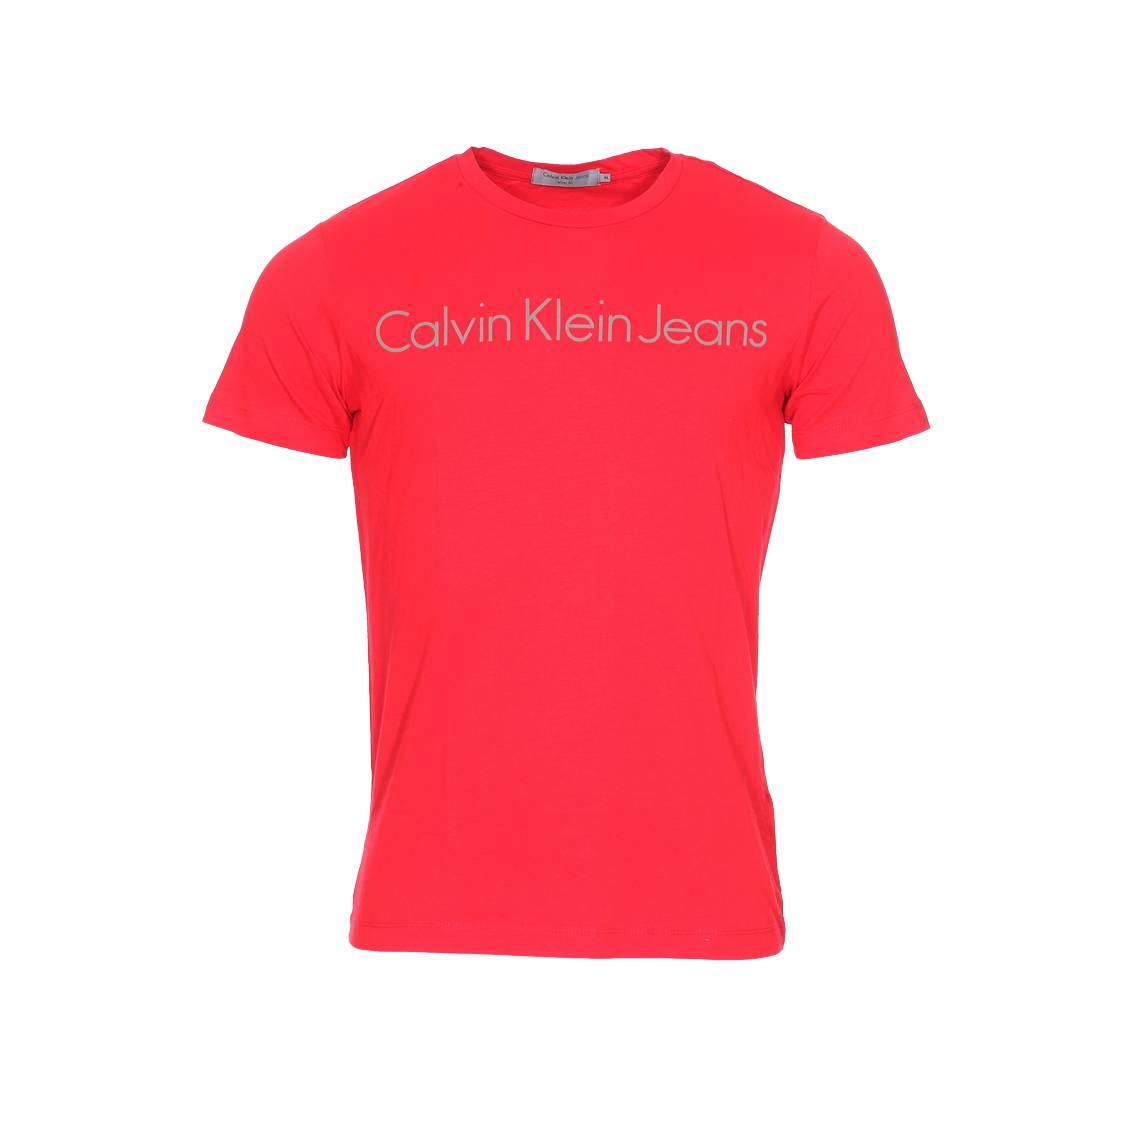 Tee-shirt col rond  treasure en coton rouge